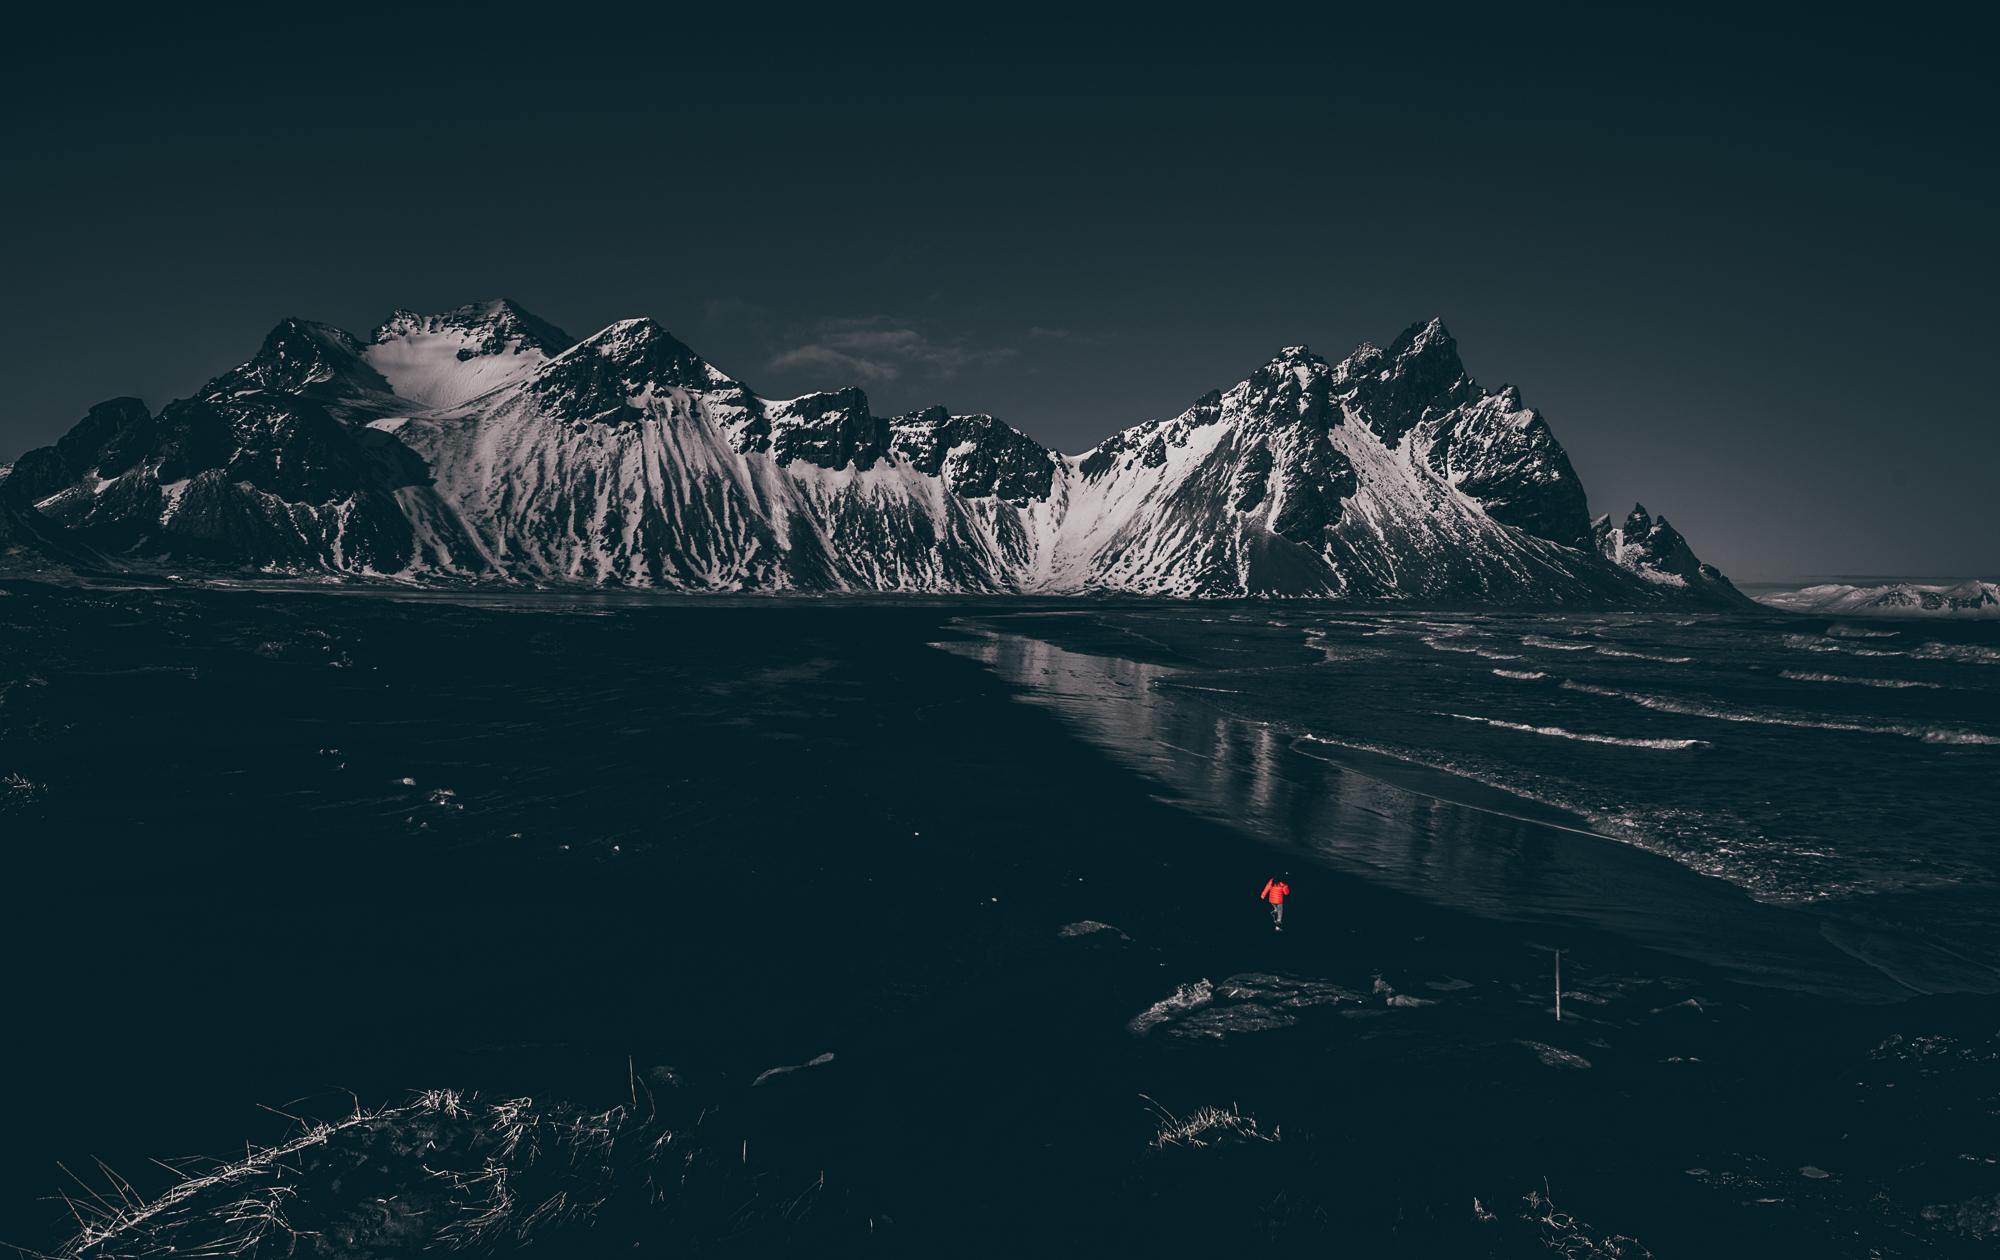 iceland-8-2.jpg